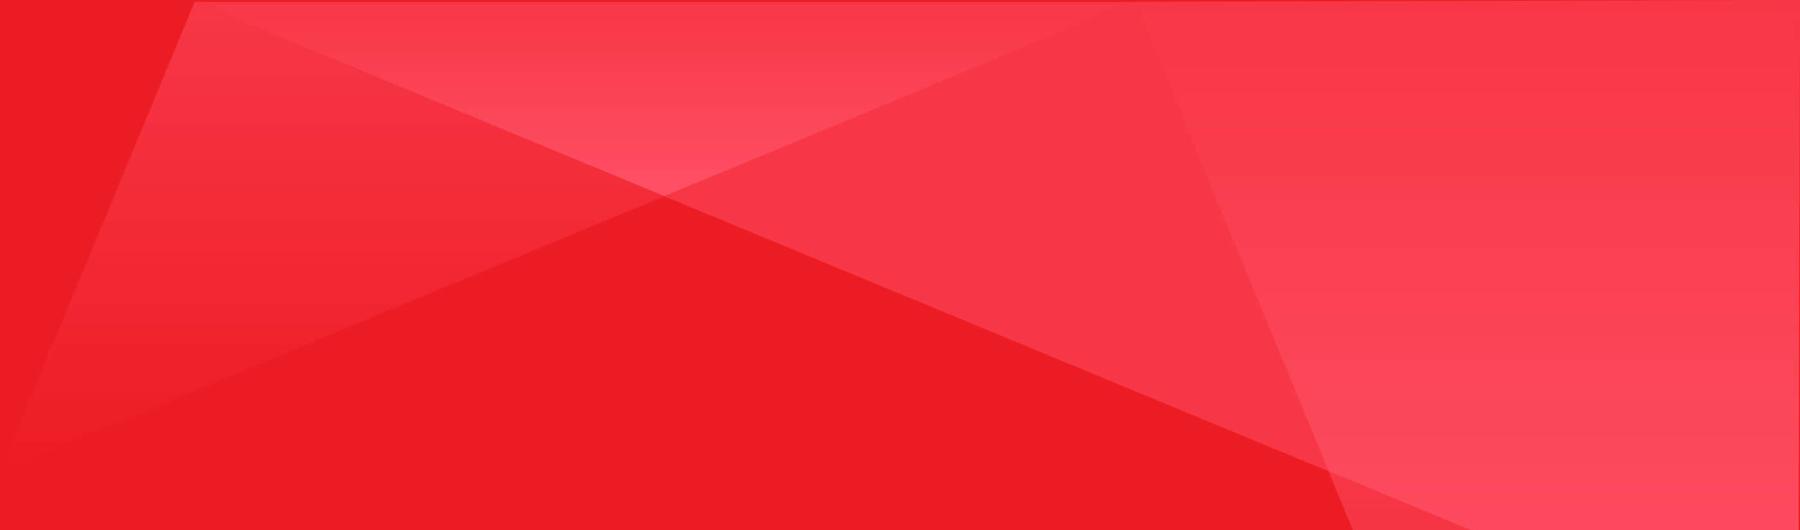 Bath Ruby Conference 2016